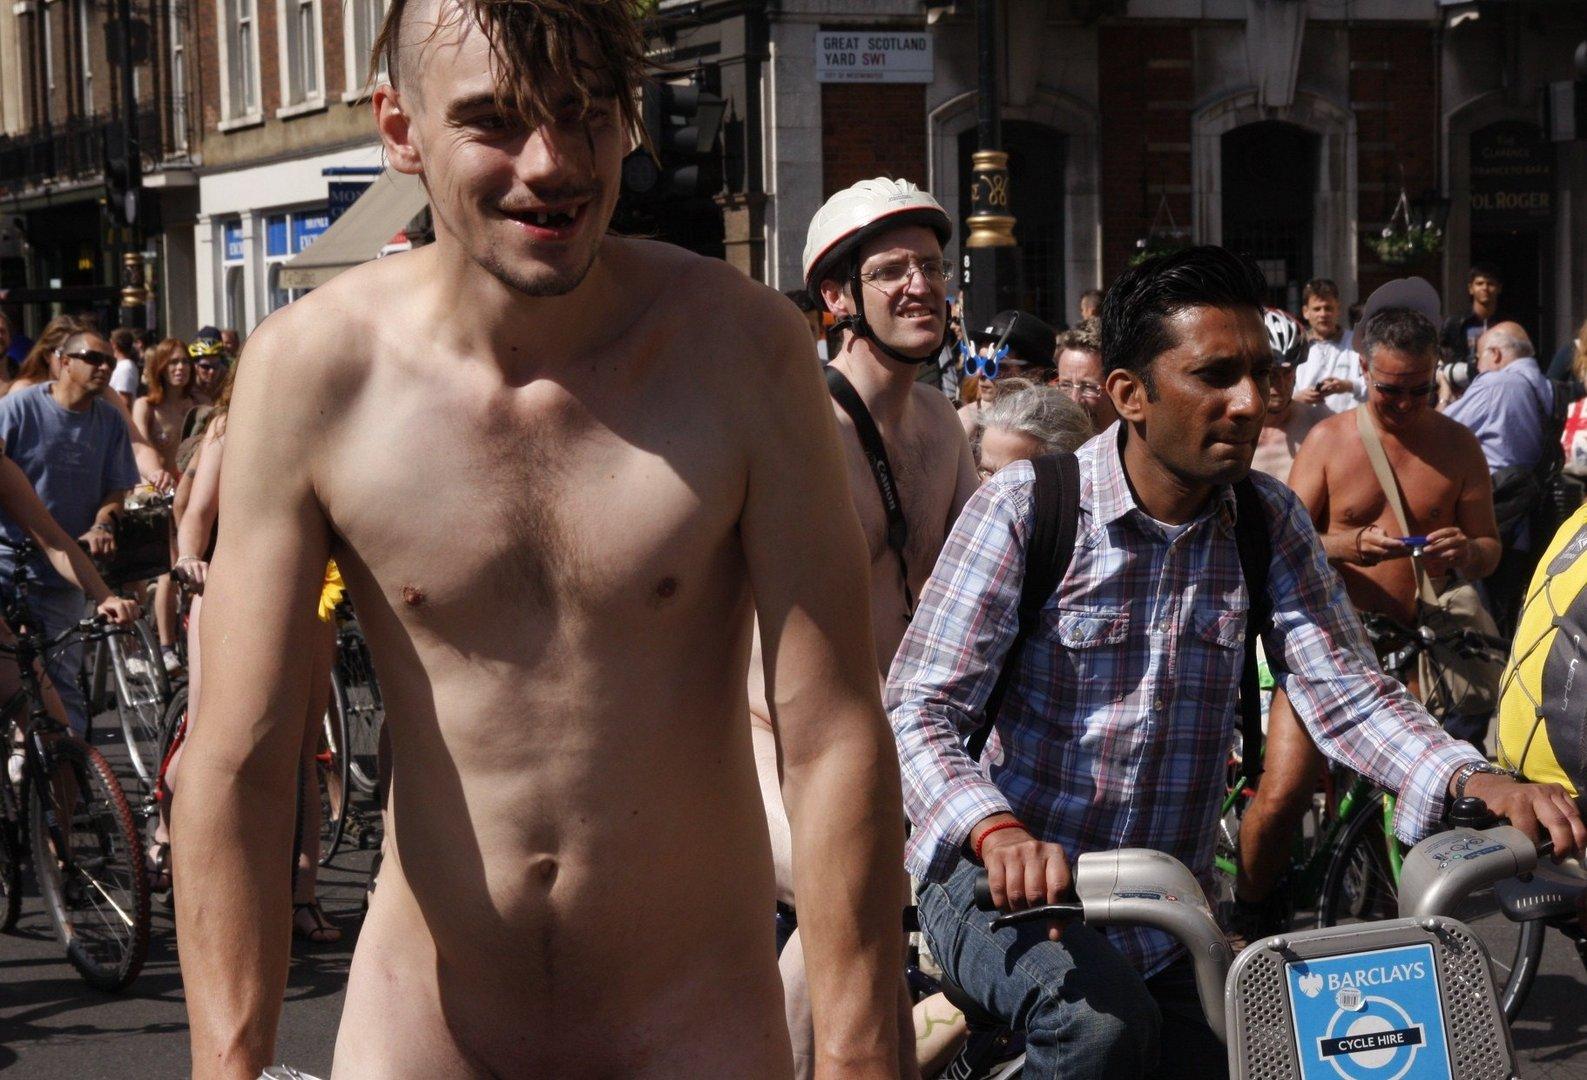 world naked bike ride 2013 london